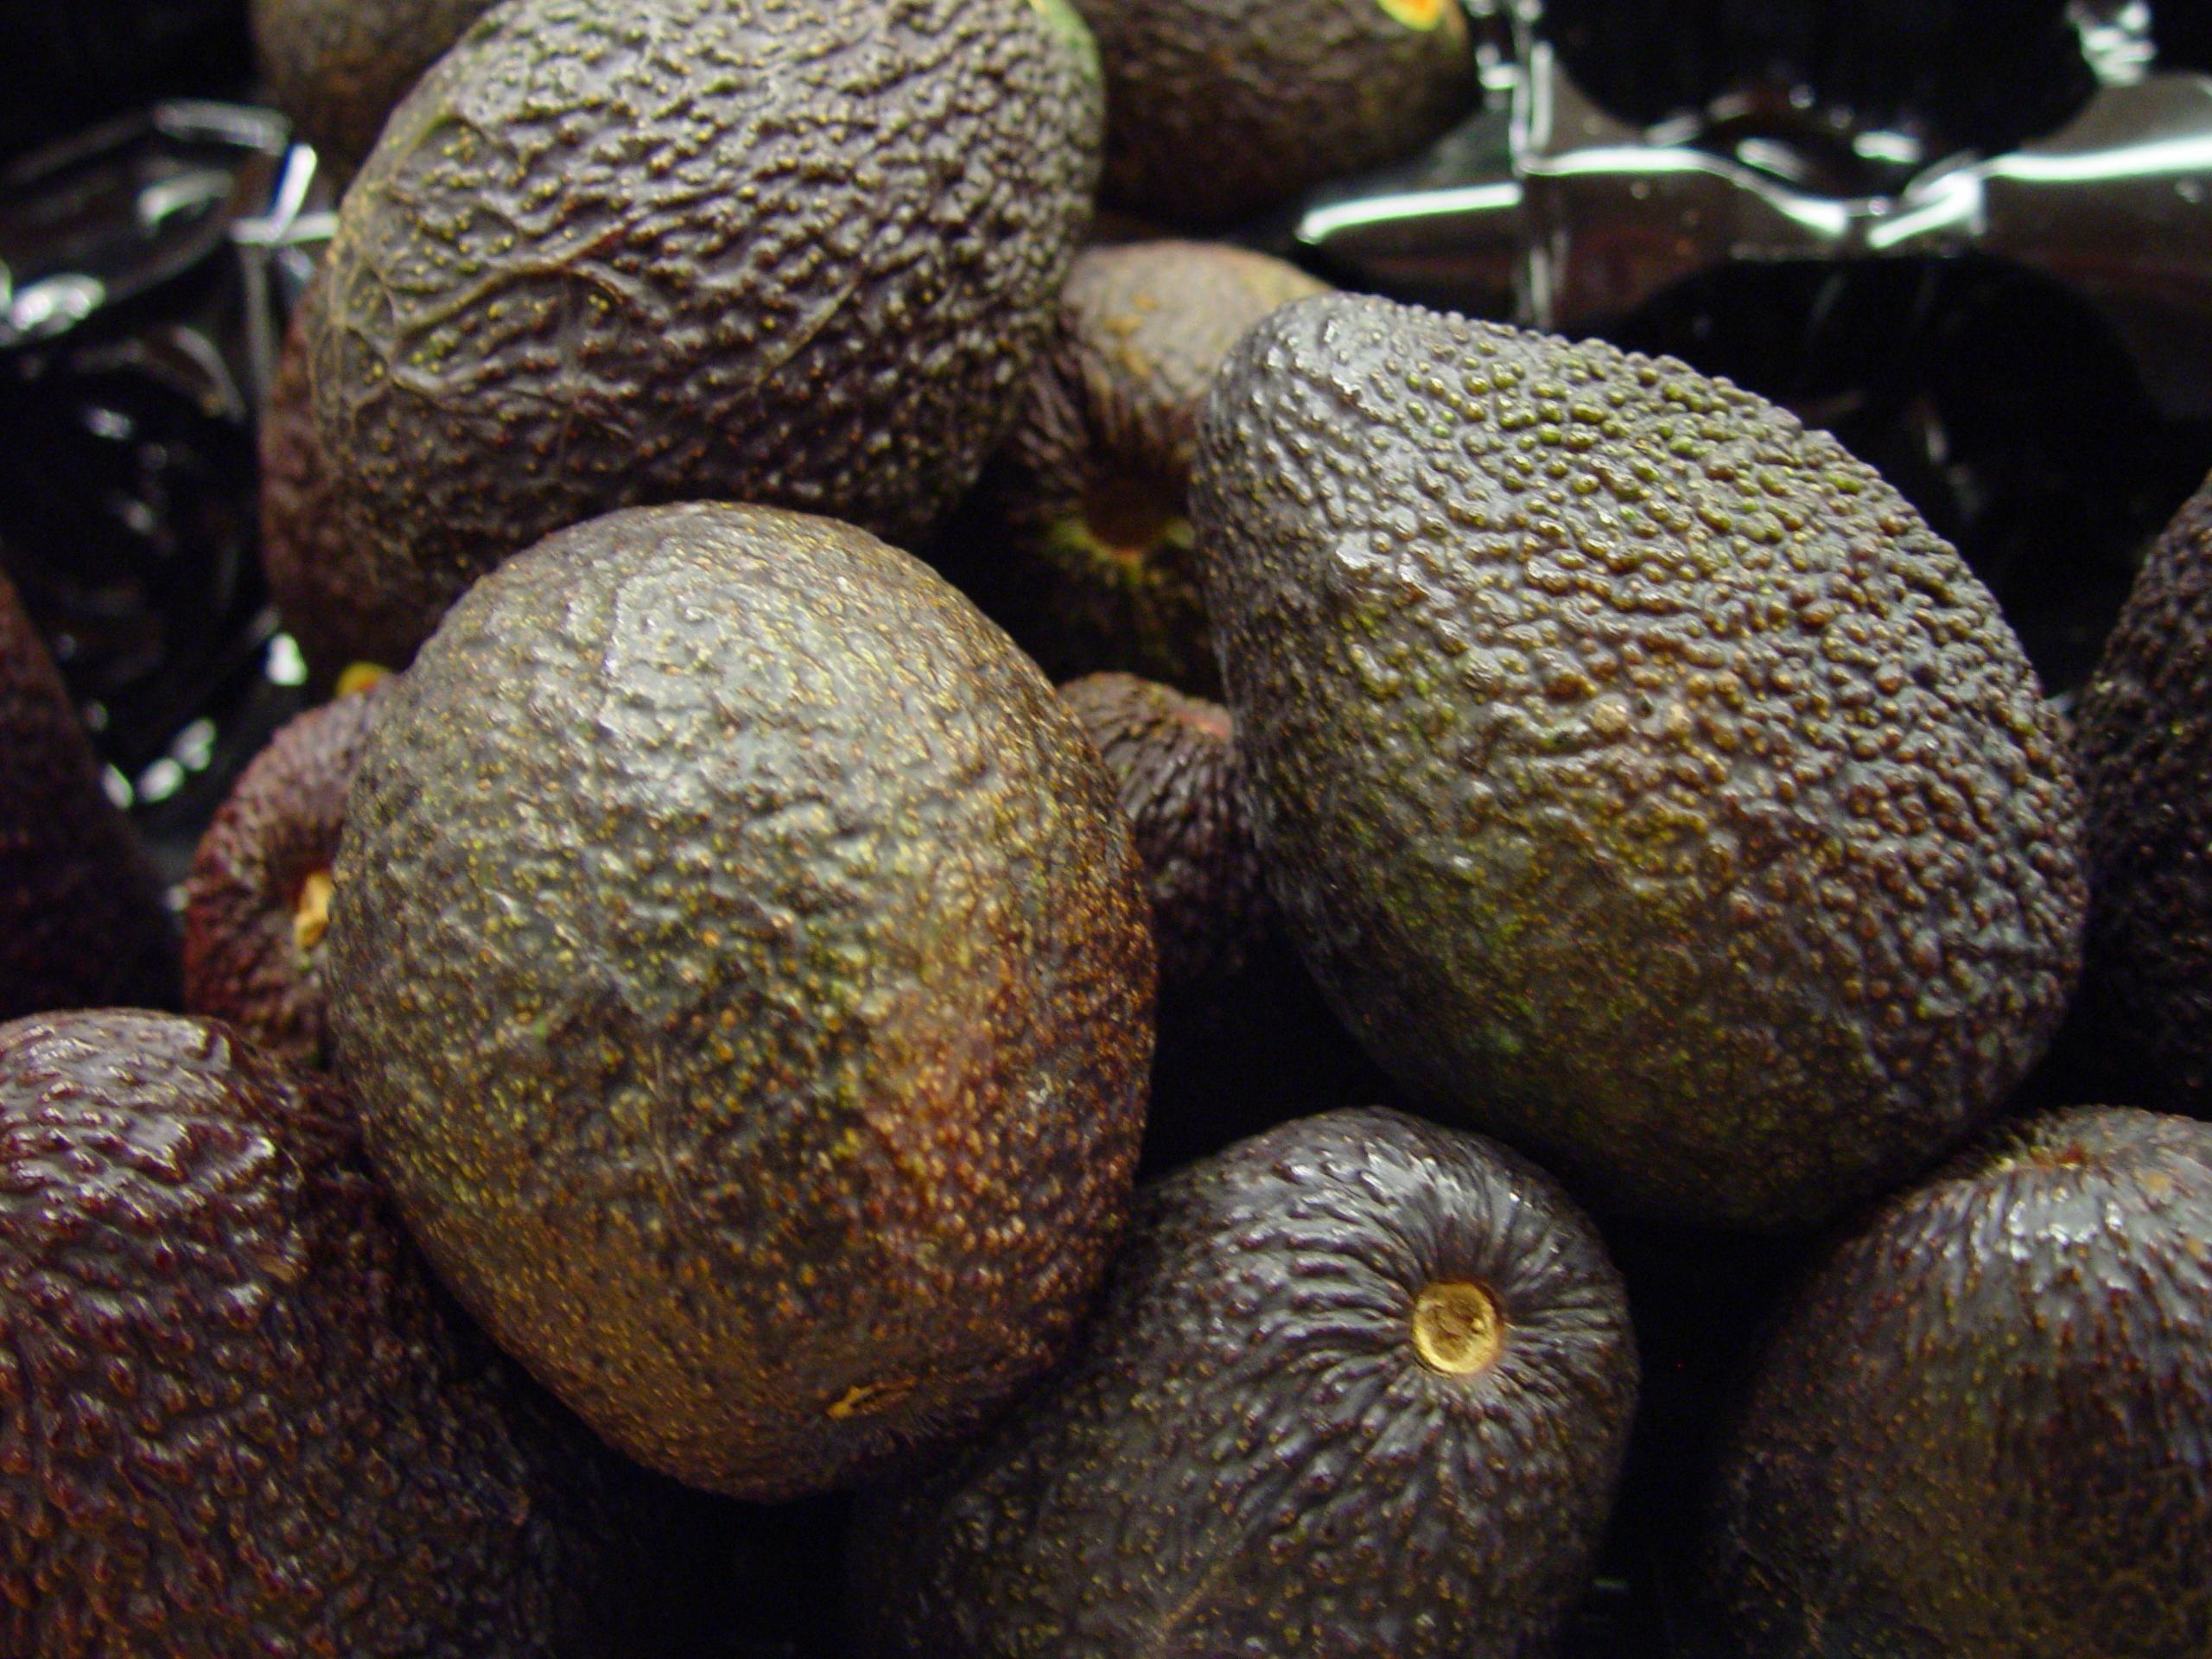 Bunch of avocados photo